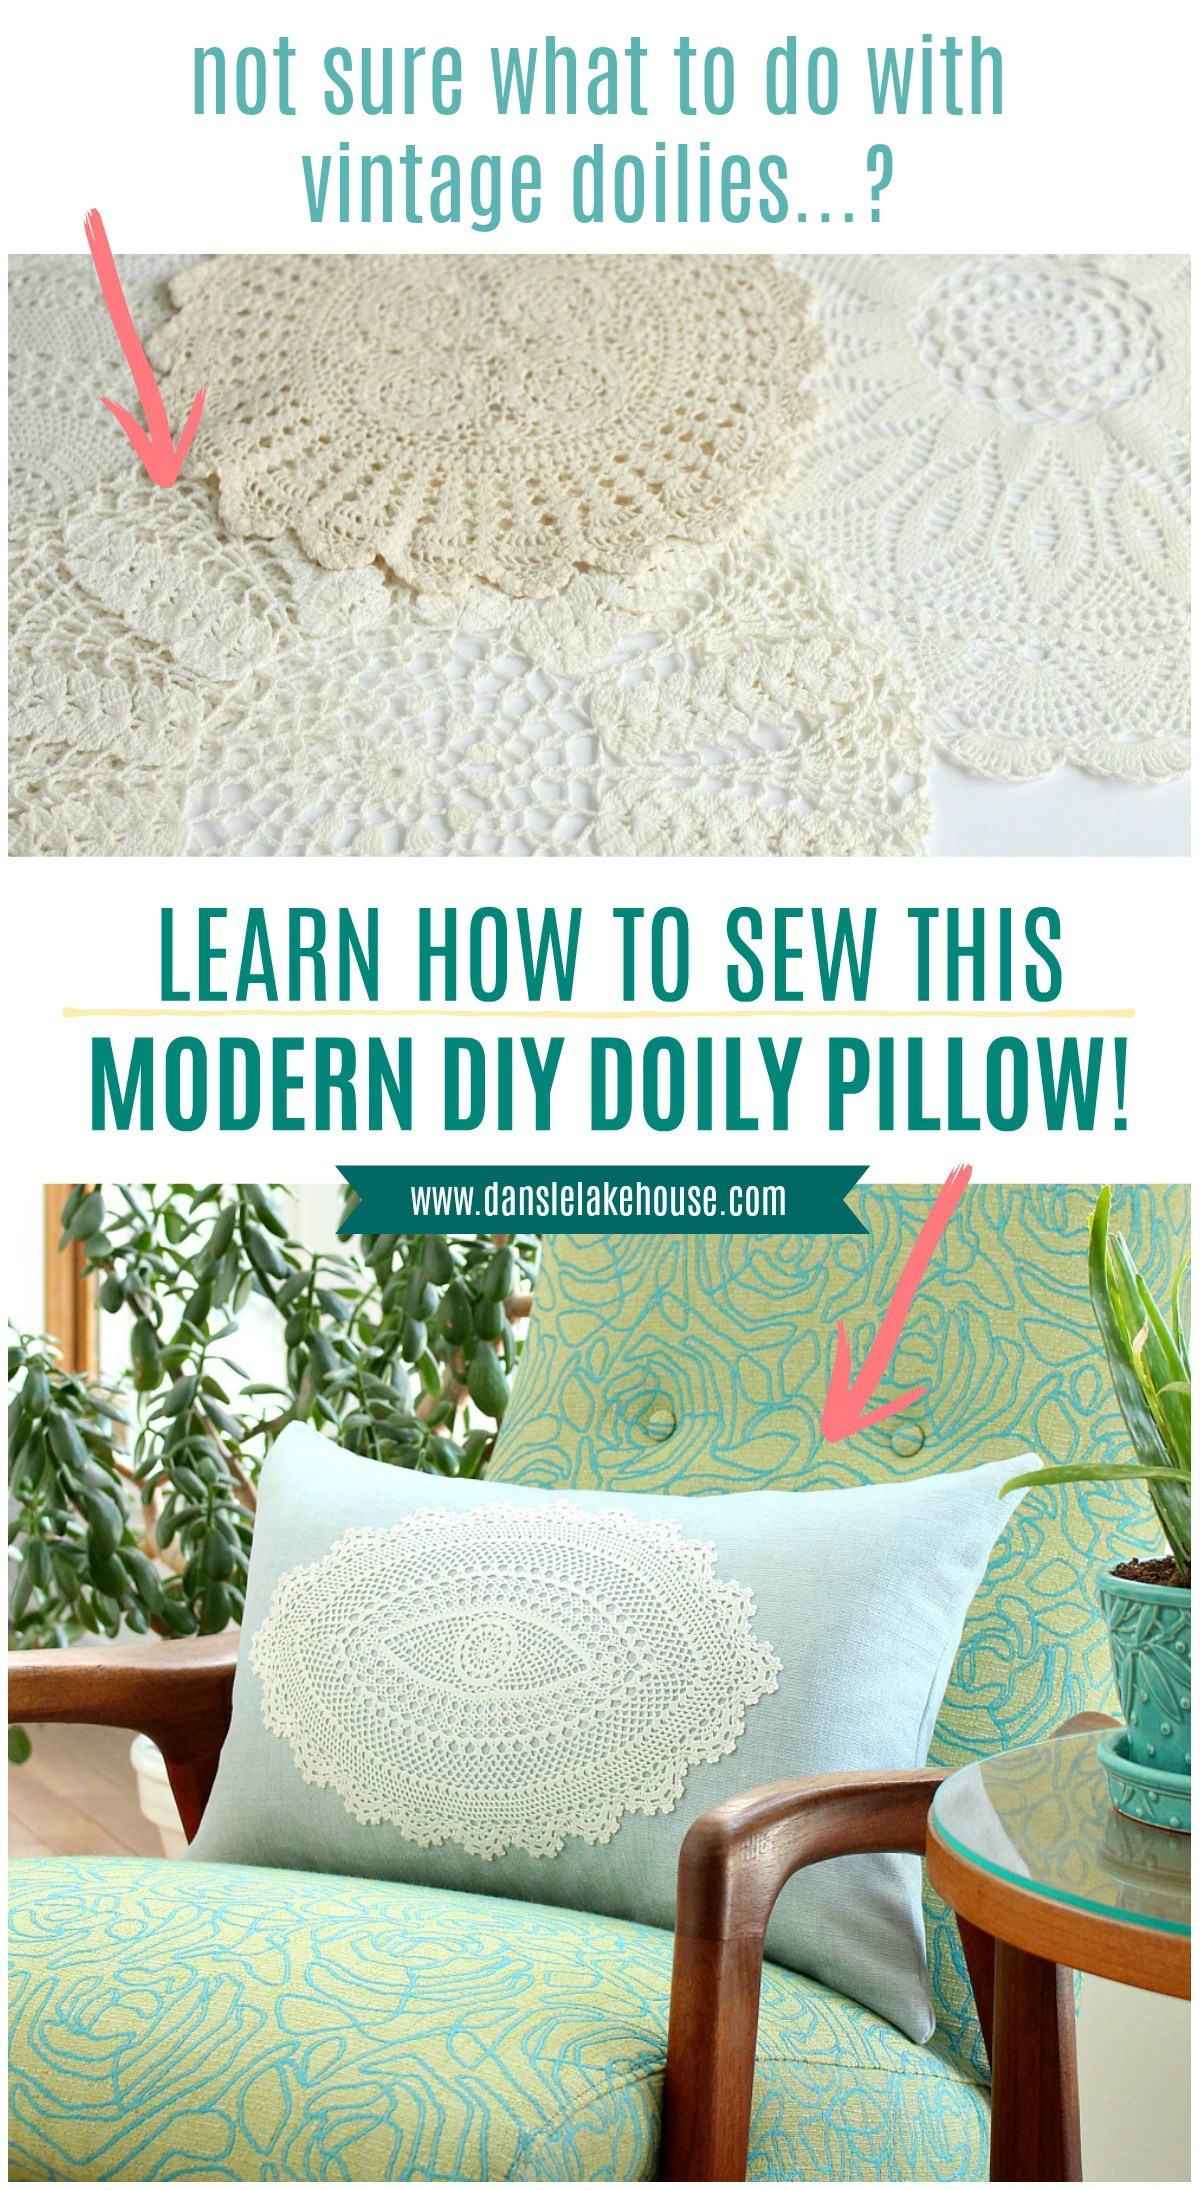 DIY Doily Craft Idea: Modern DIY Doily Pillow